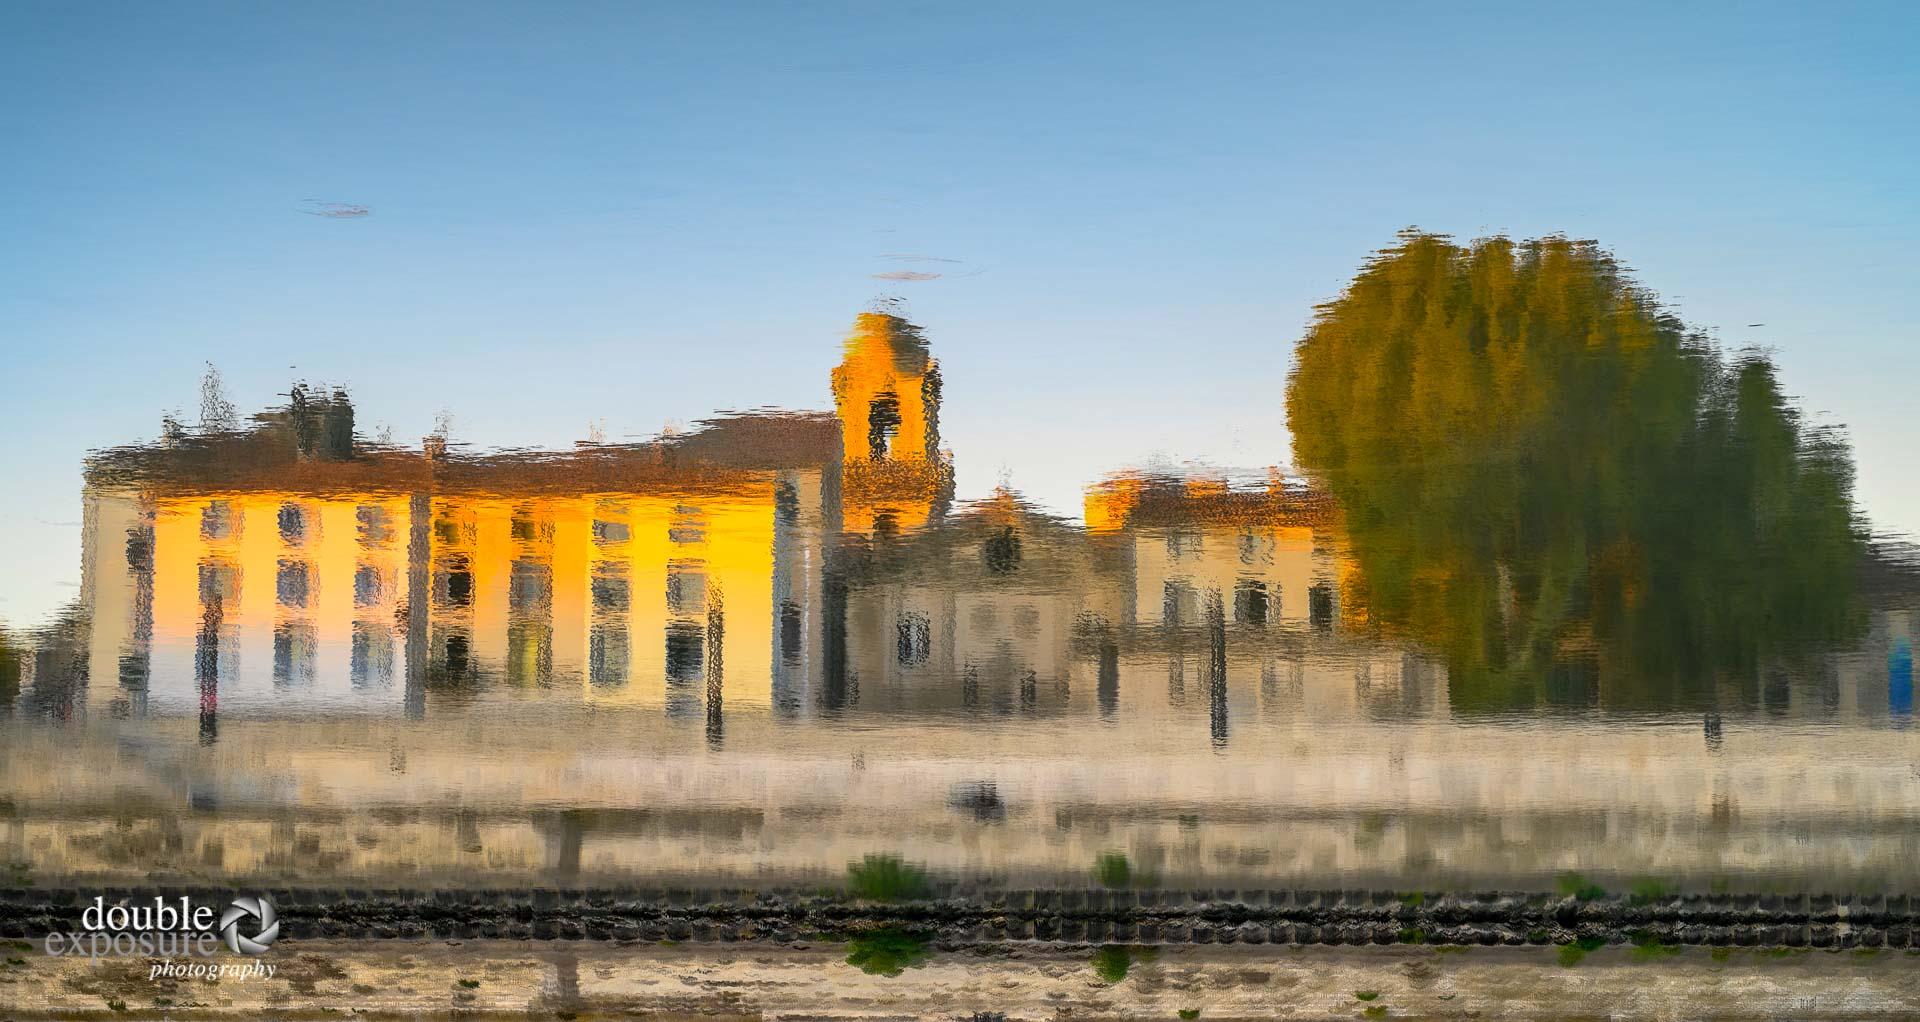 Sunrise on the Rhone in Arles